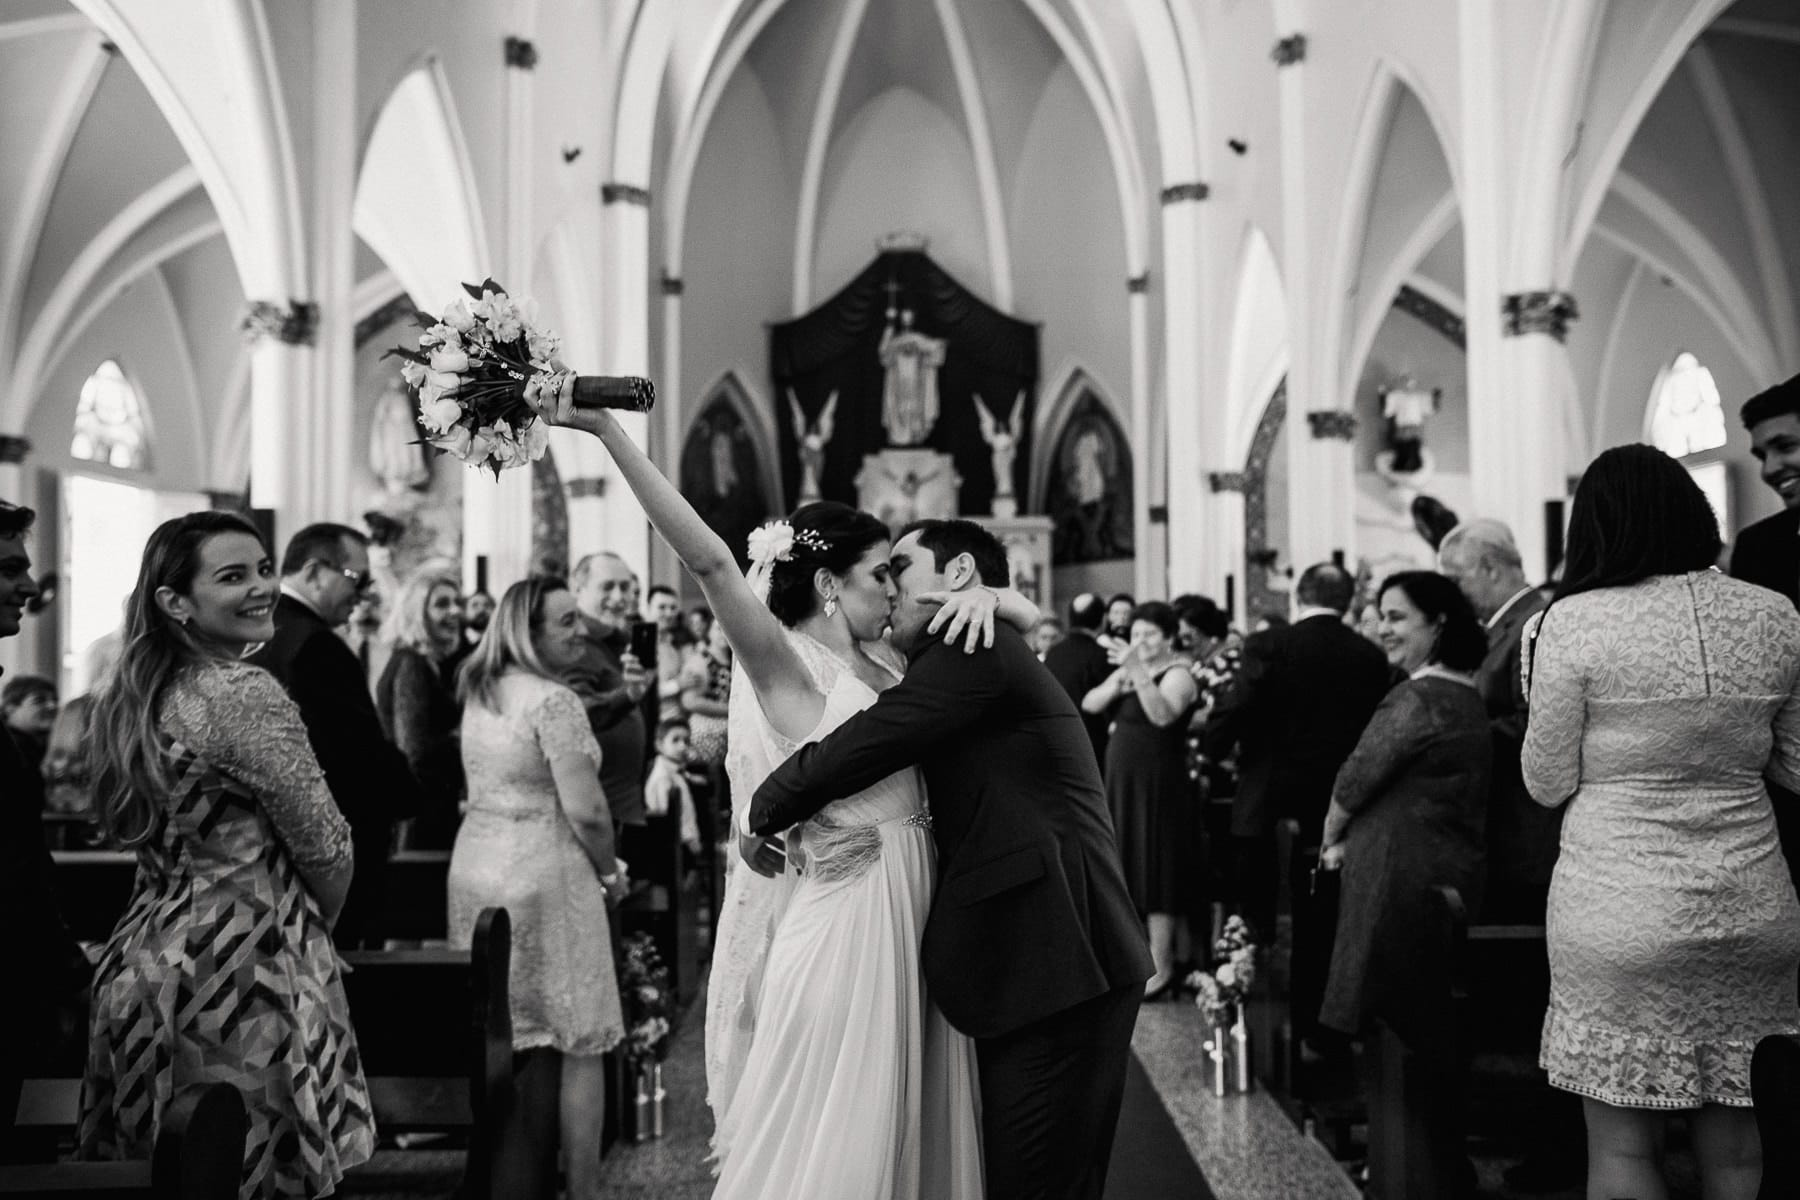 casamento-igreja-do-cristo-rei-fortaleza-56